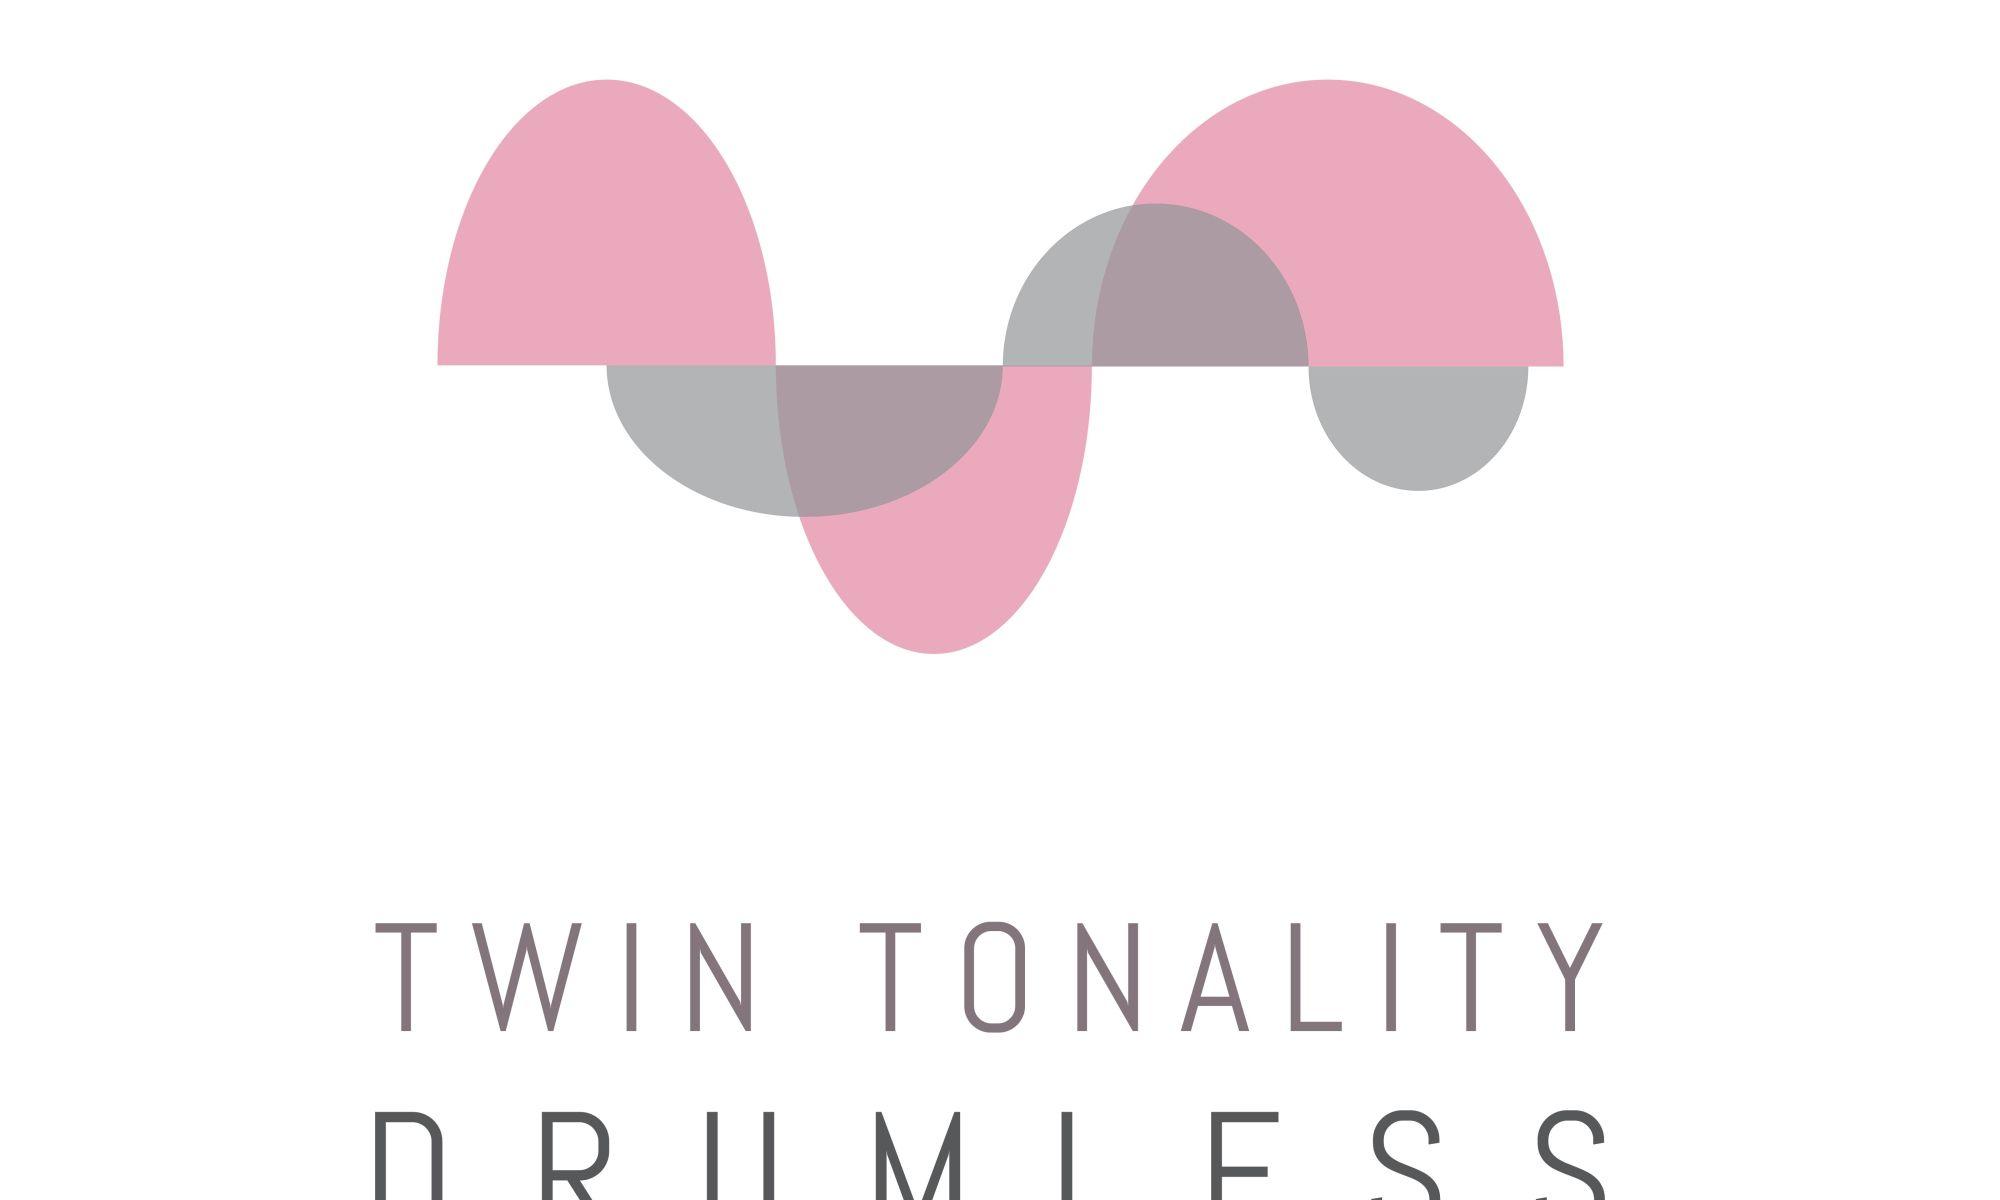 twin tonality drumless